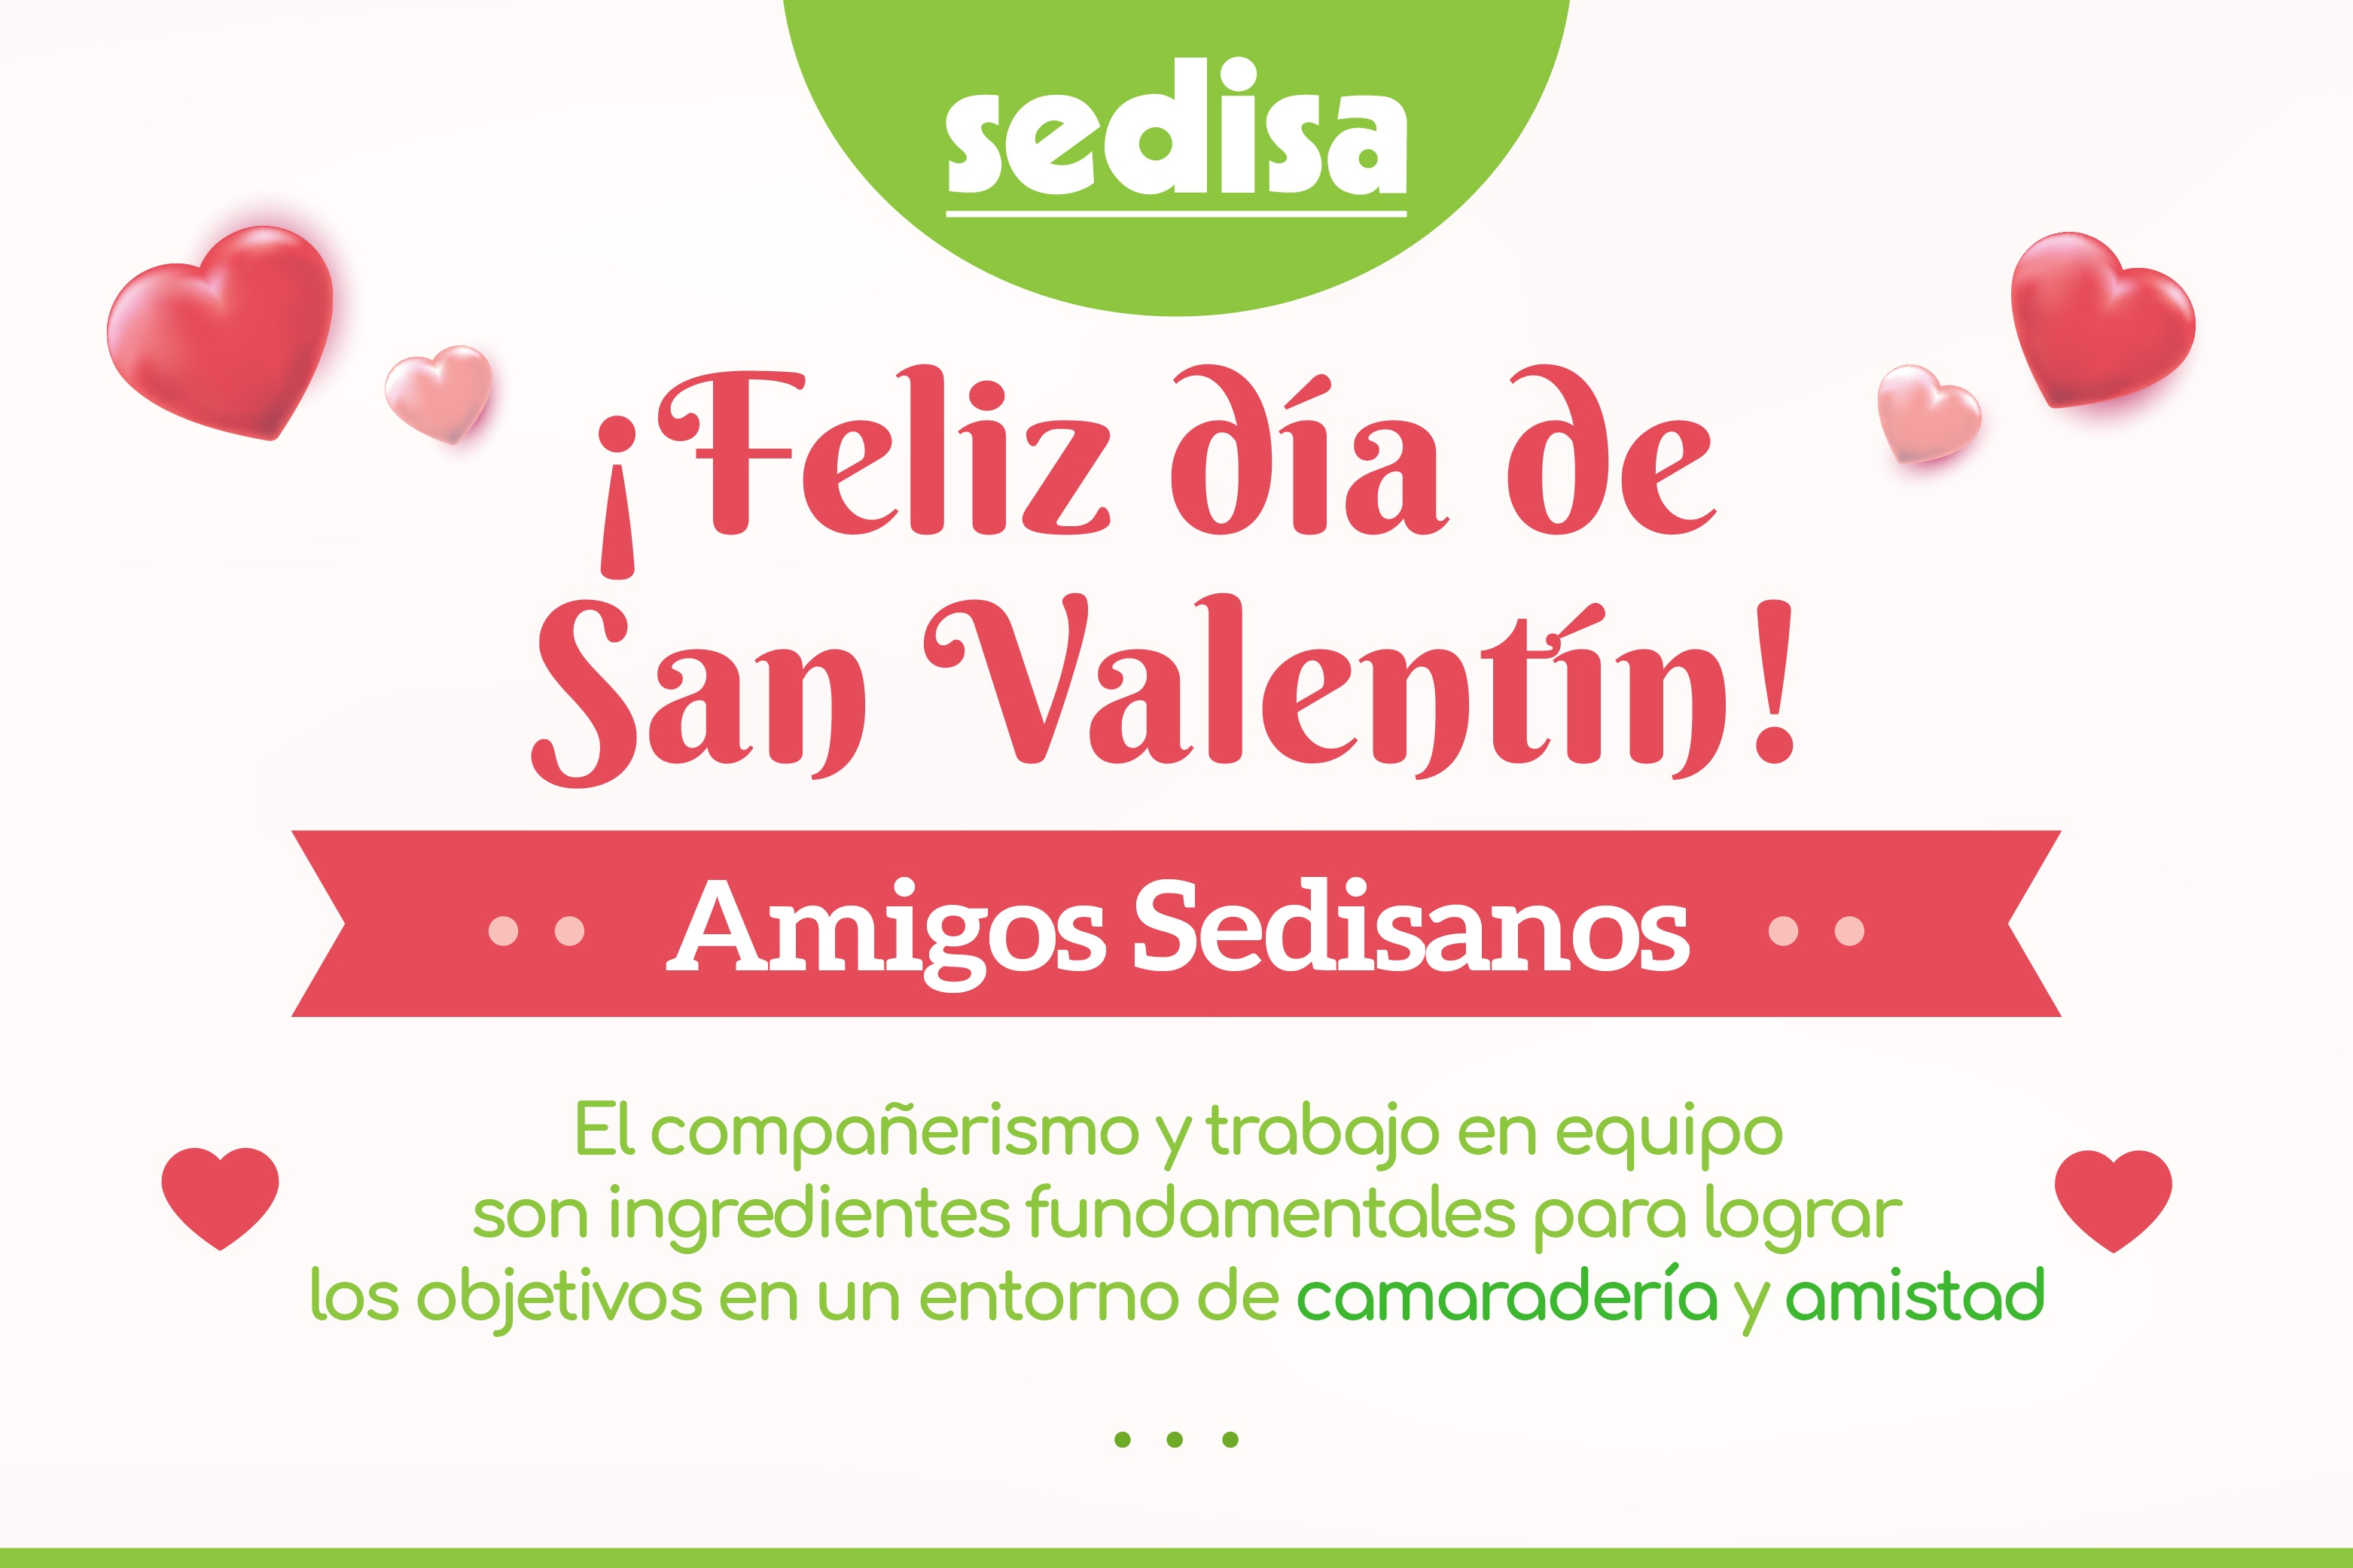 ¡Feliz San Valentín Sedisano!